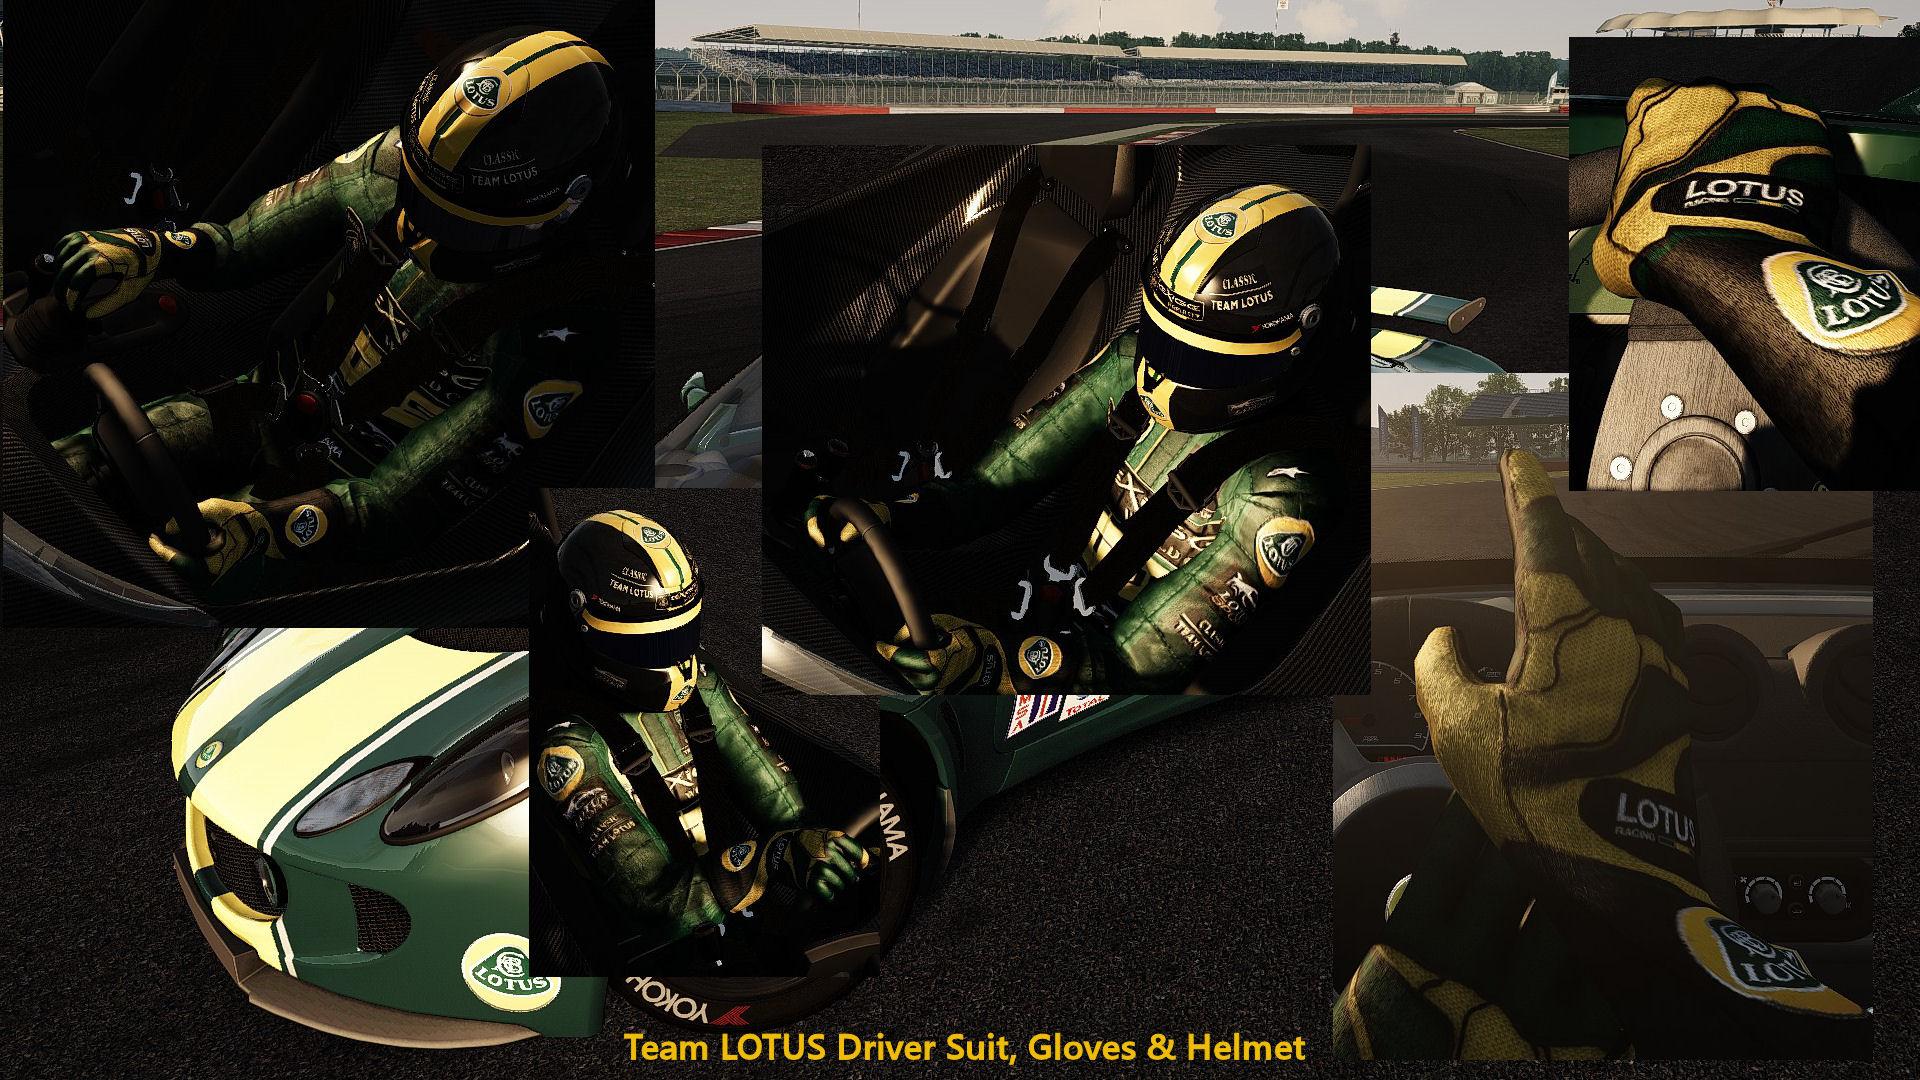 Lotus Suit